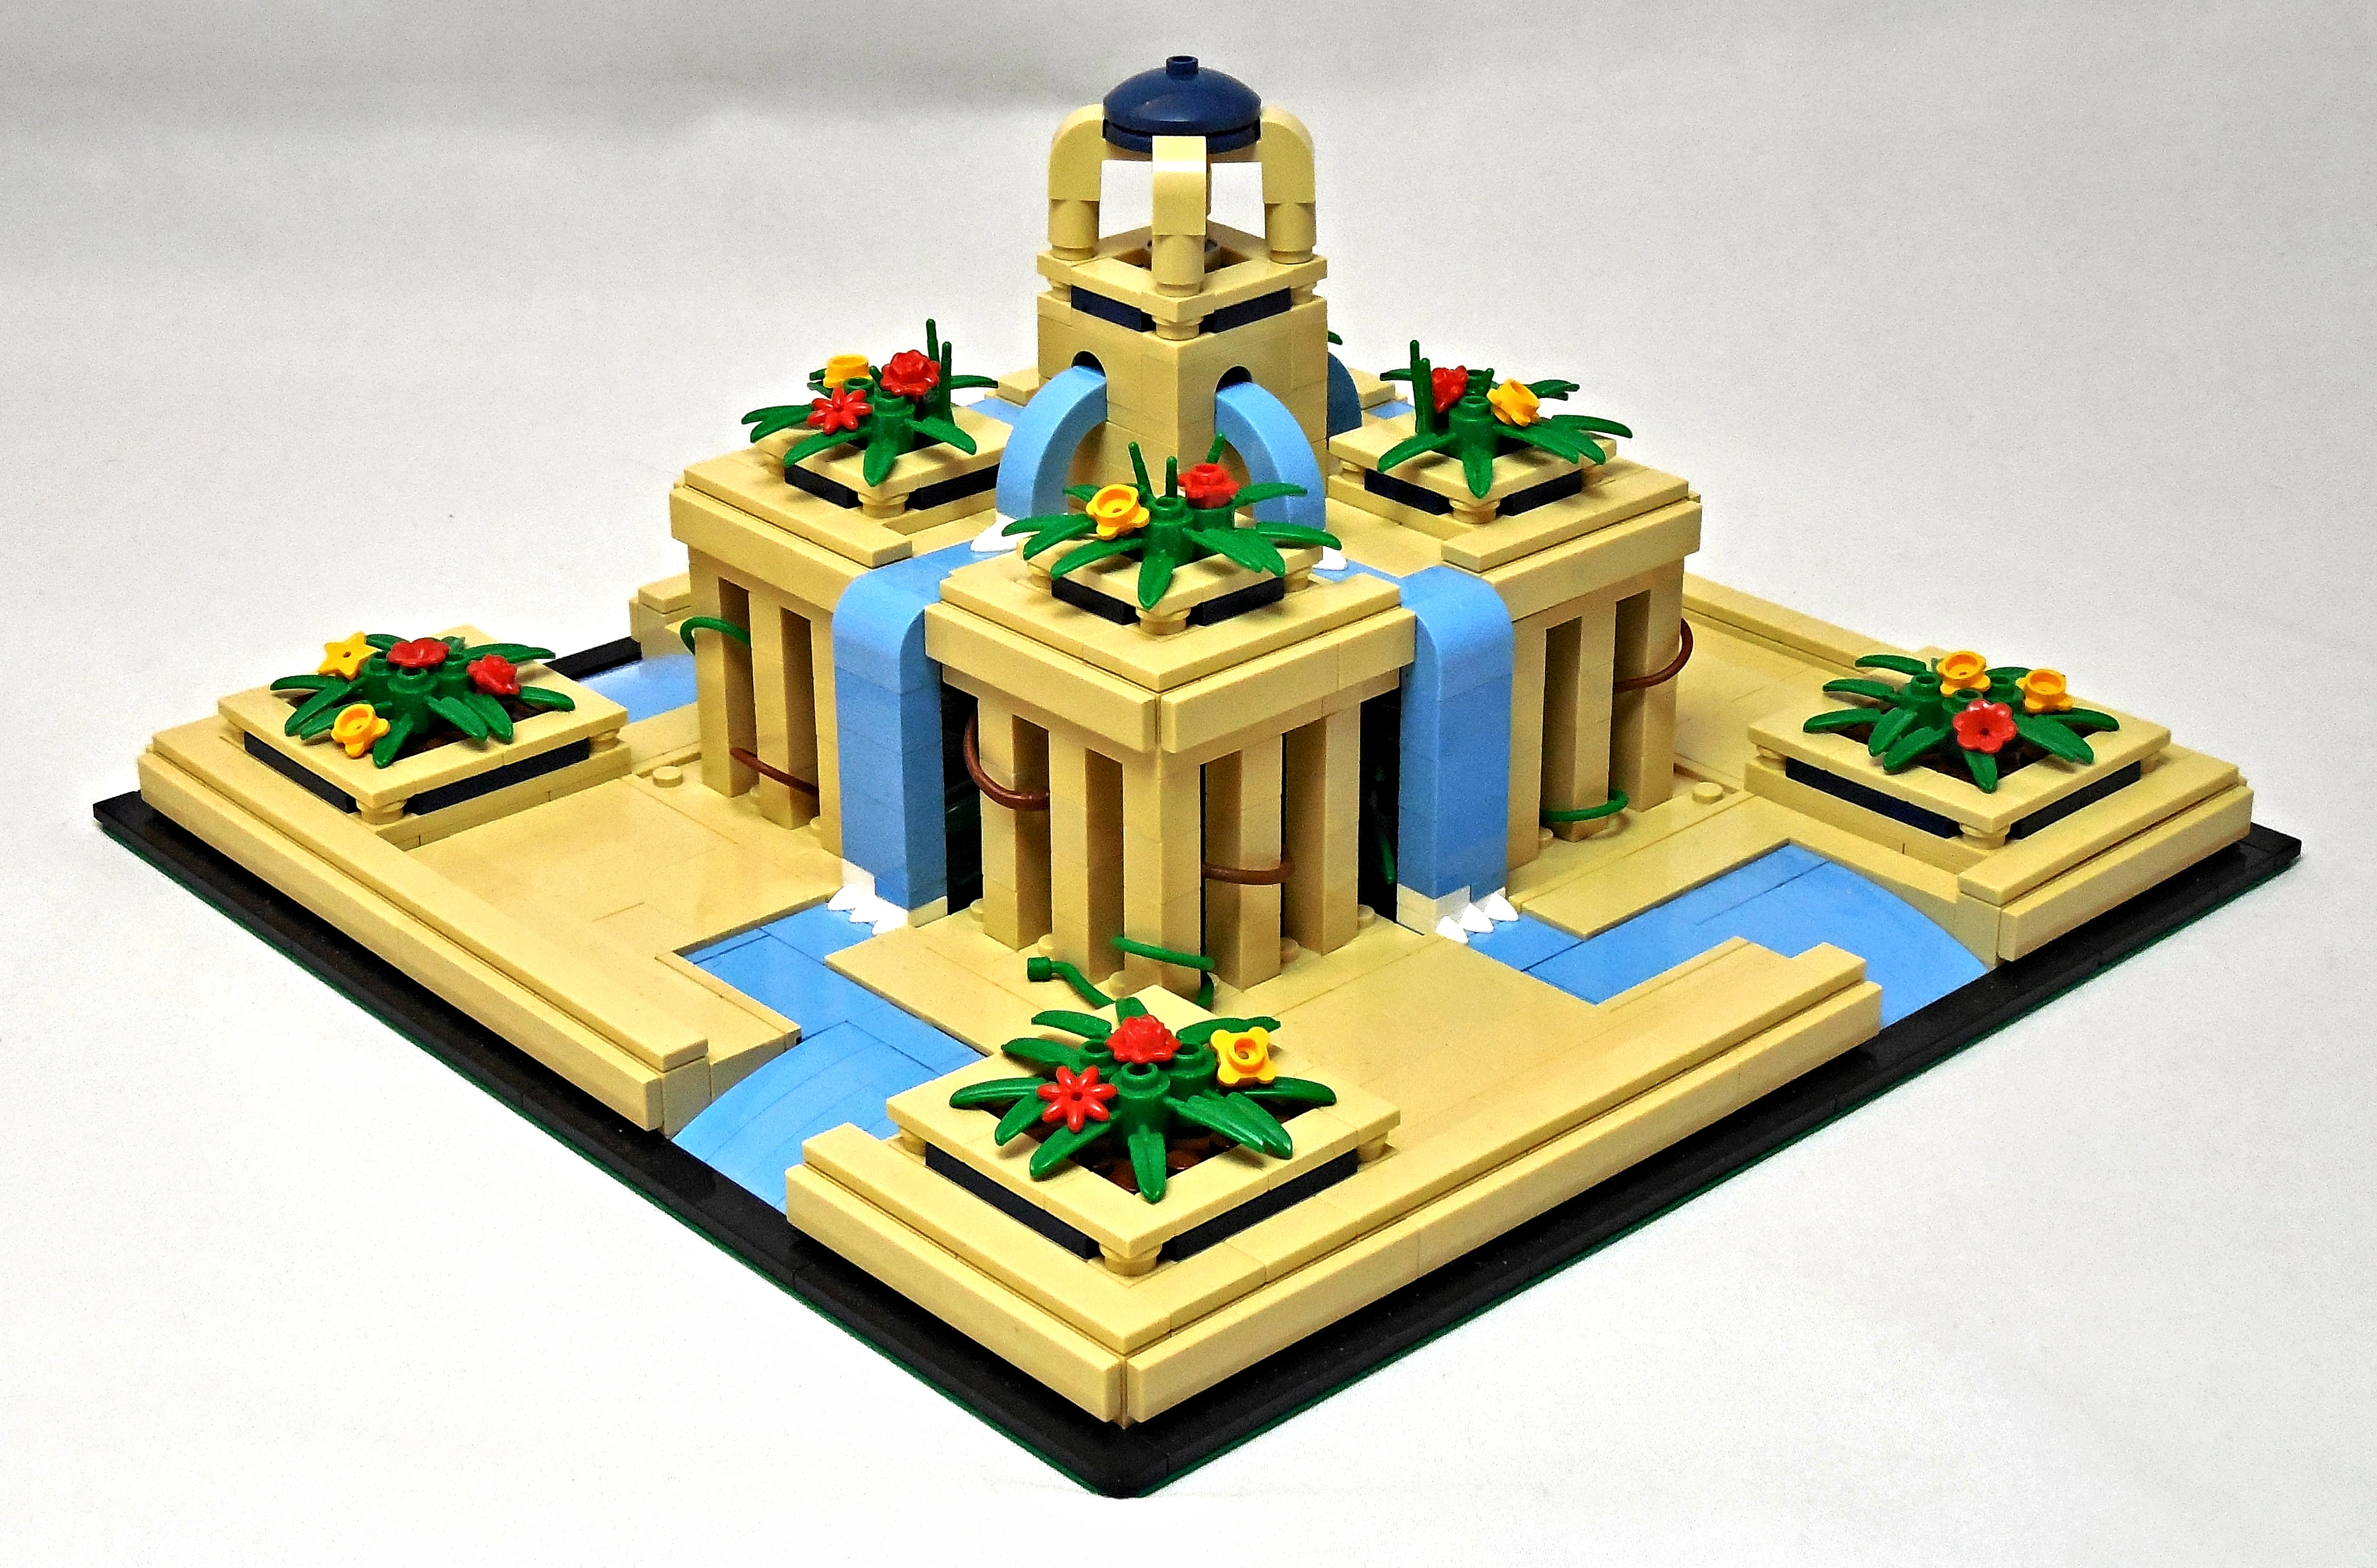 LEGO® MOC by Vitreolum: Hanging Gardens